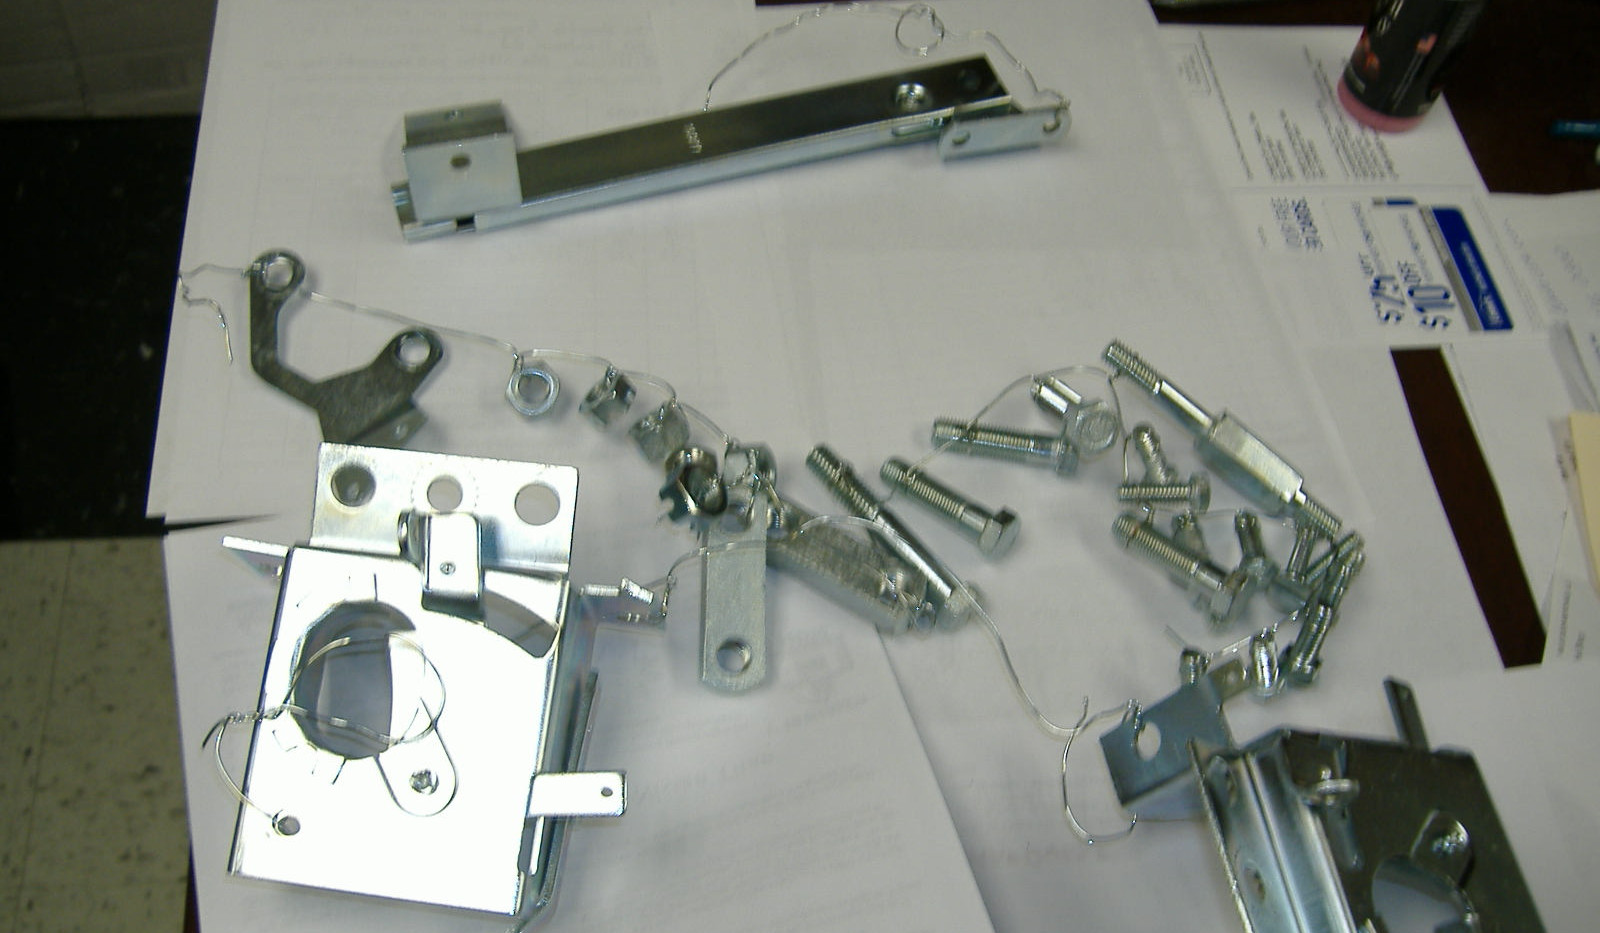 Original parts and hardware